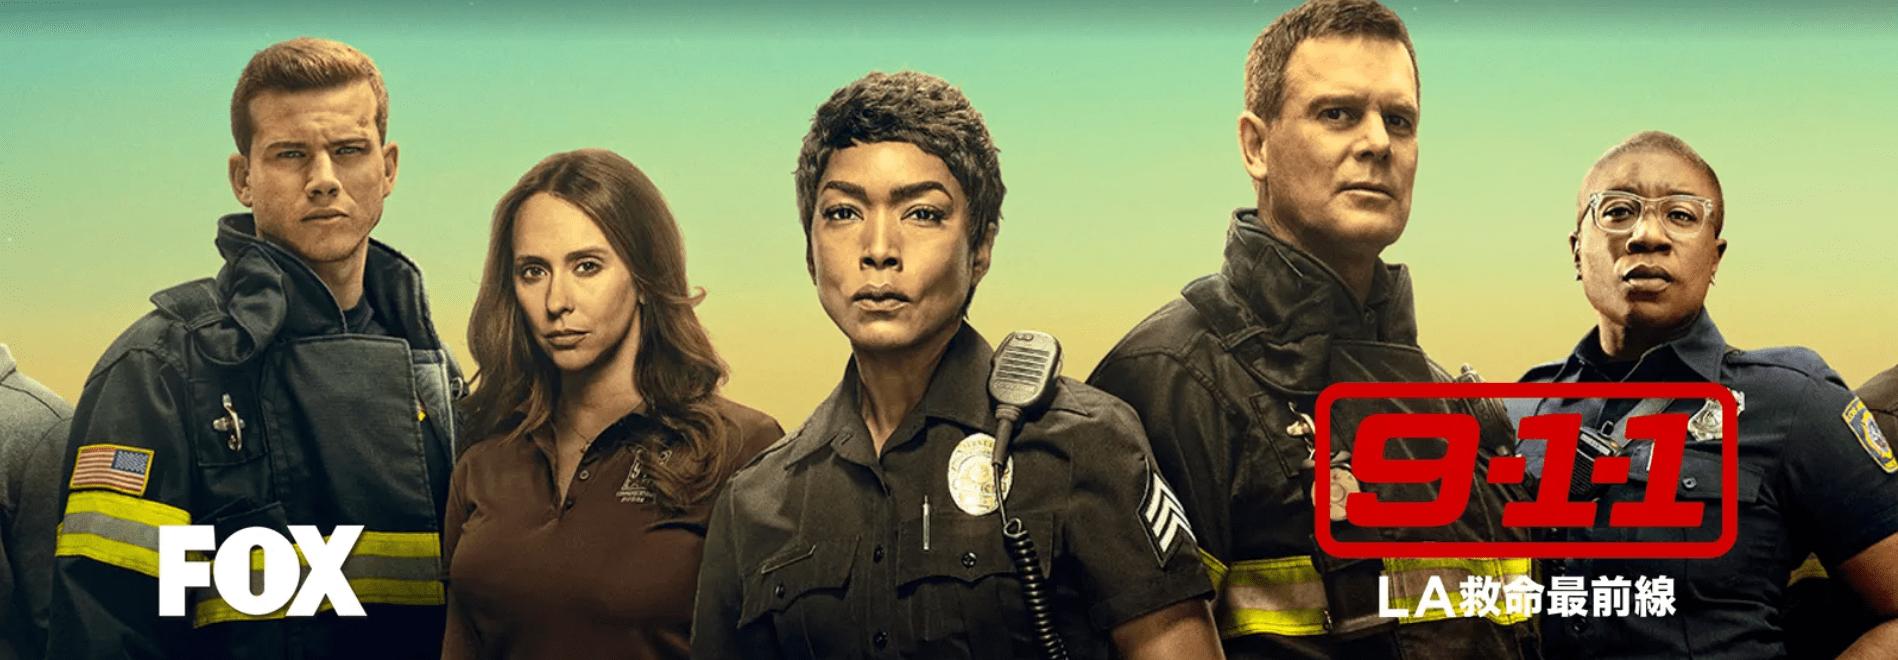 【Huluおすすめ海外ドラマ】Hulu(フールー)のおすすめ海外ドラマ作品一覧|ウォーキングデッド・ゲームオブスローンズ・Huluプレミア作品など充実!|人気作品:9-1-1:LA救急最前線 シーズン3